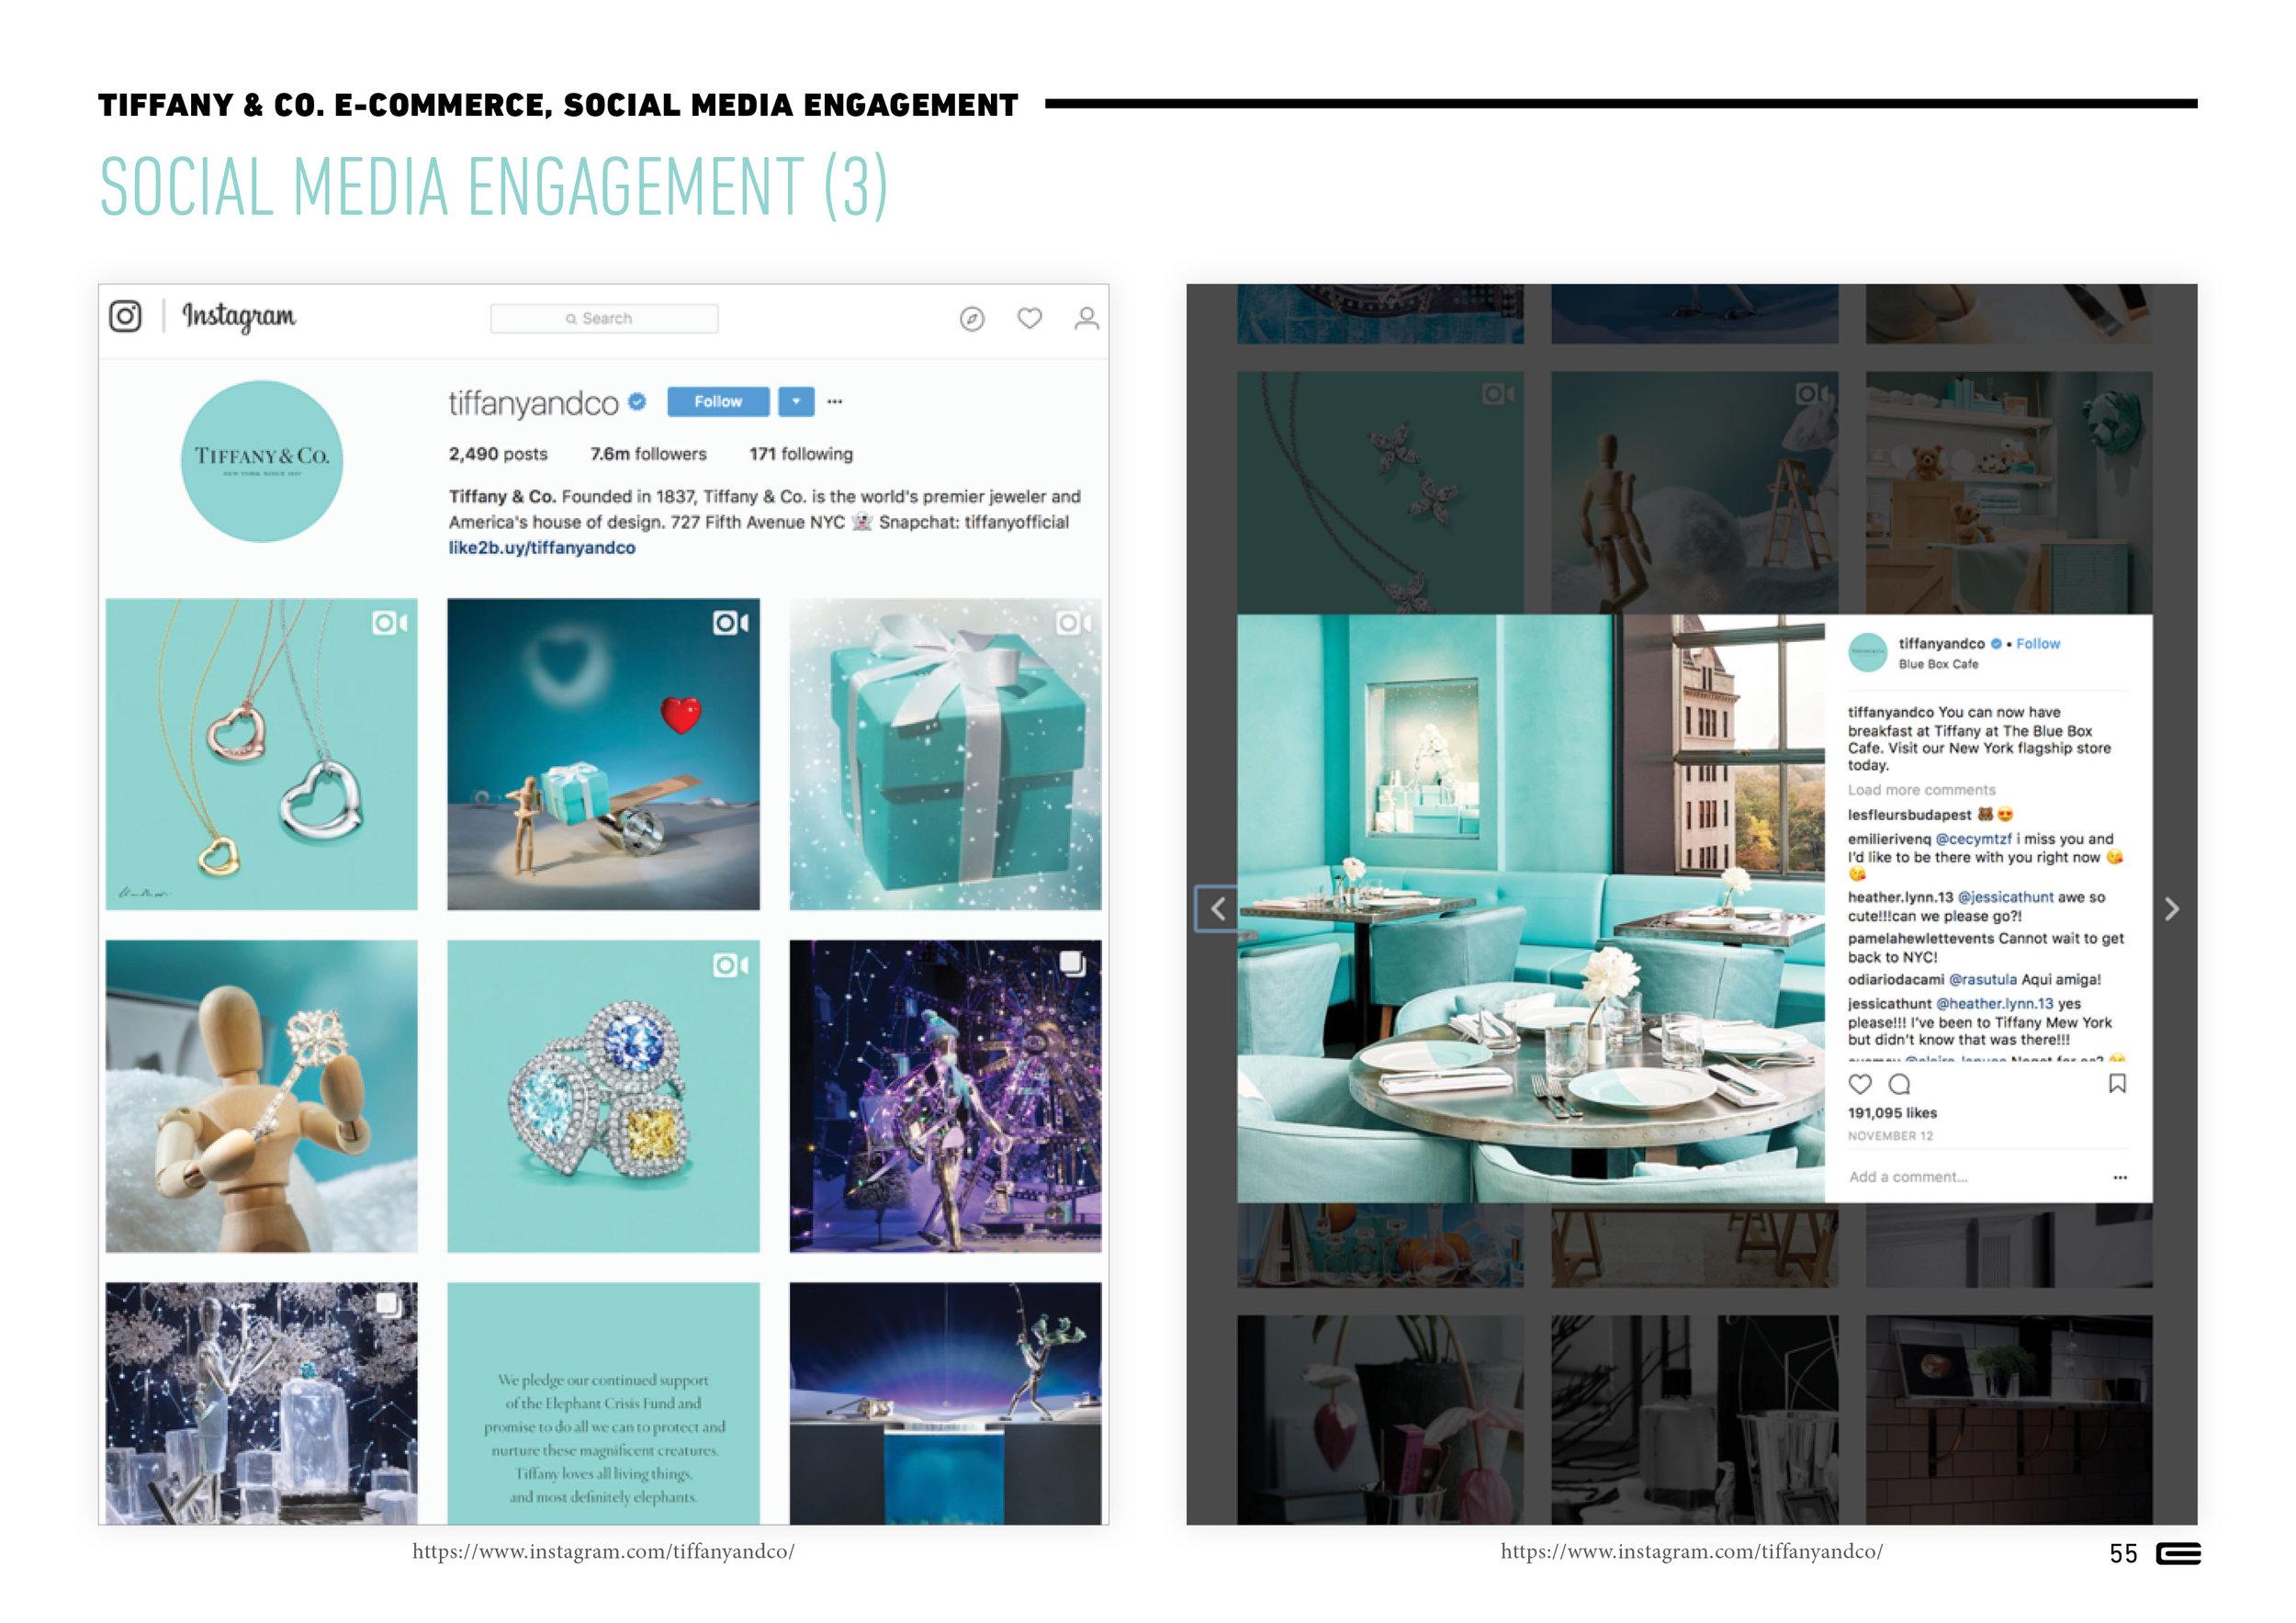 EC - VIC 2018 Presentation on Tiffany55.jpg